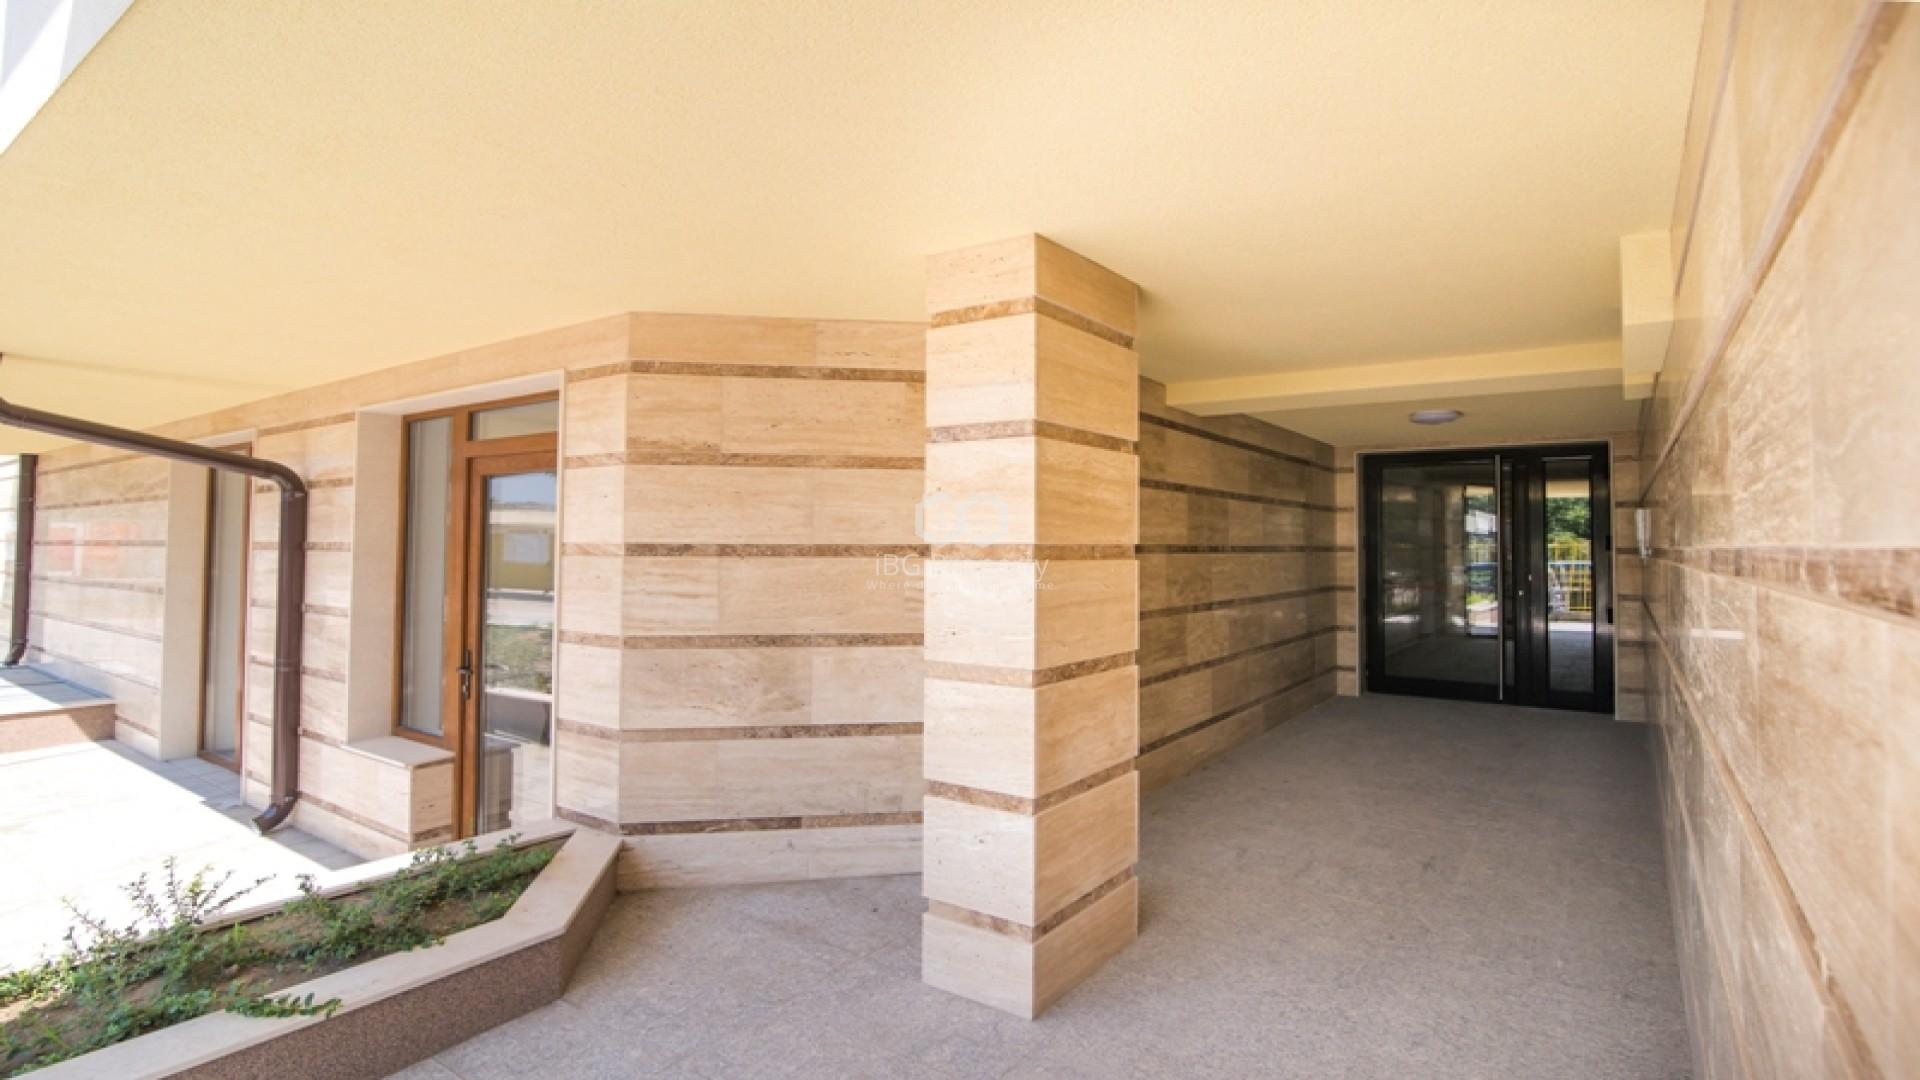 Тристаен апартамент Победа Варна 114,99 m2